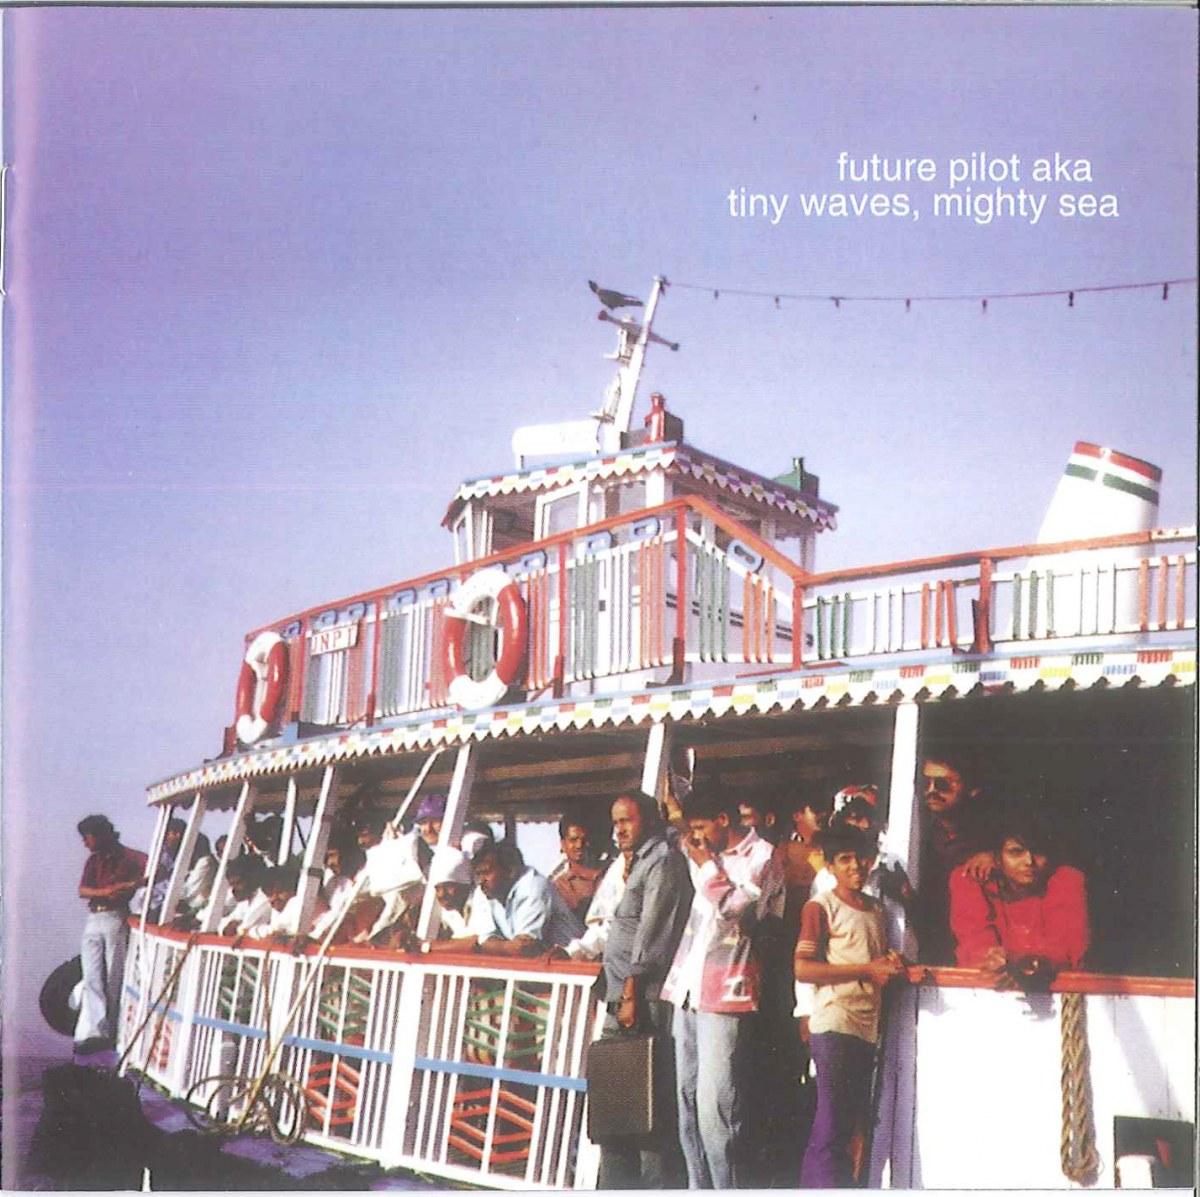 Future Pilot AKA - Tiny Waves, Mighty Sea (Standard LP